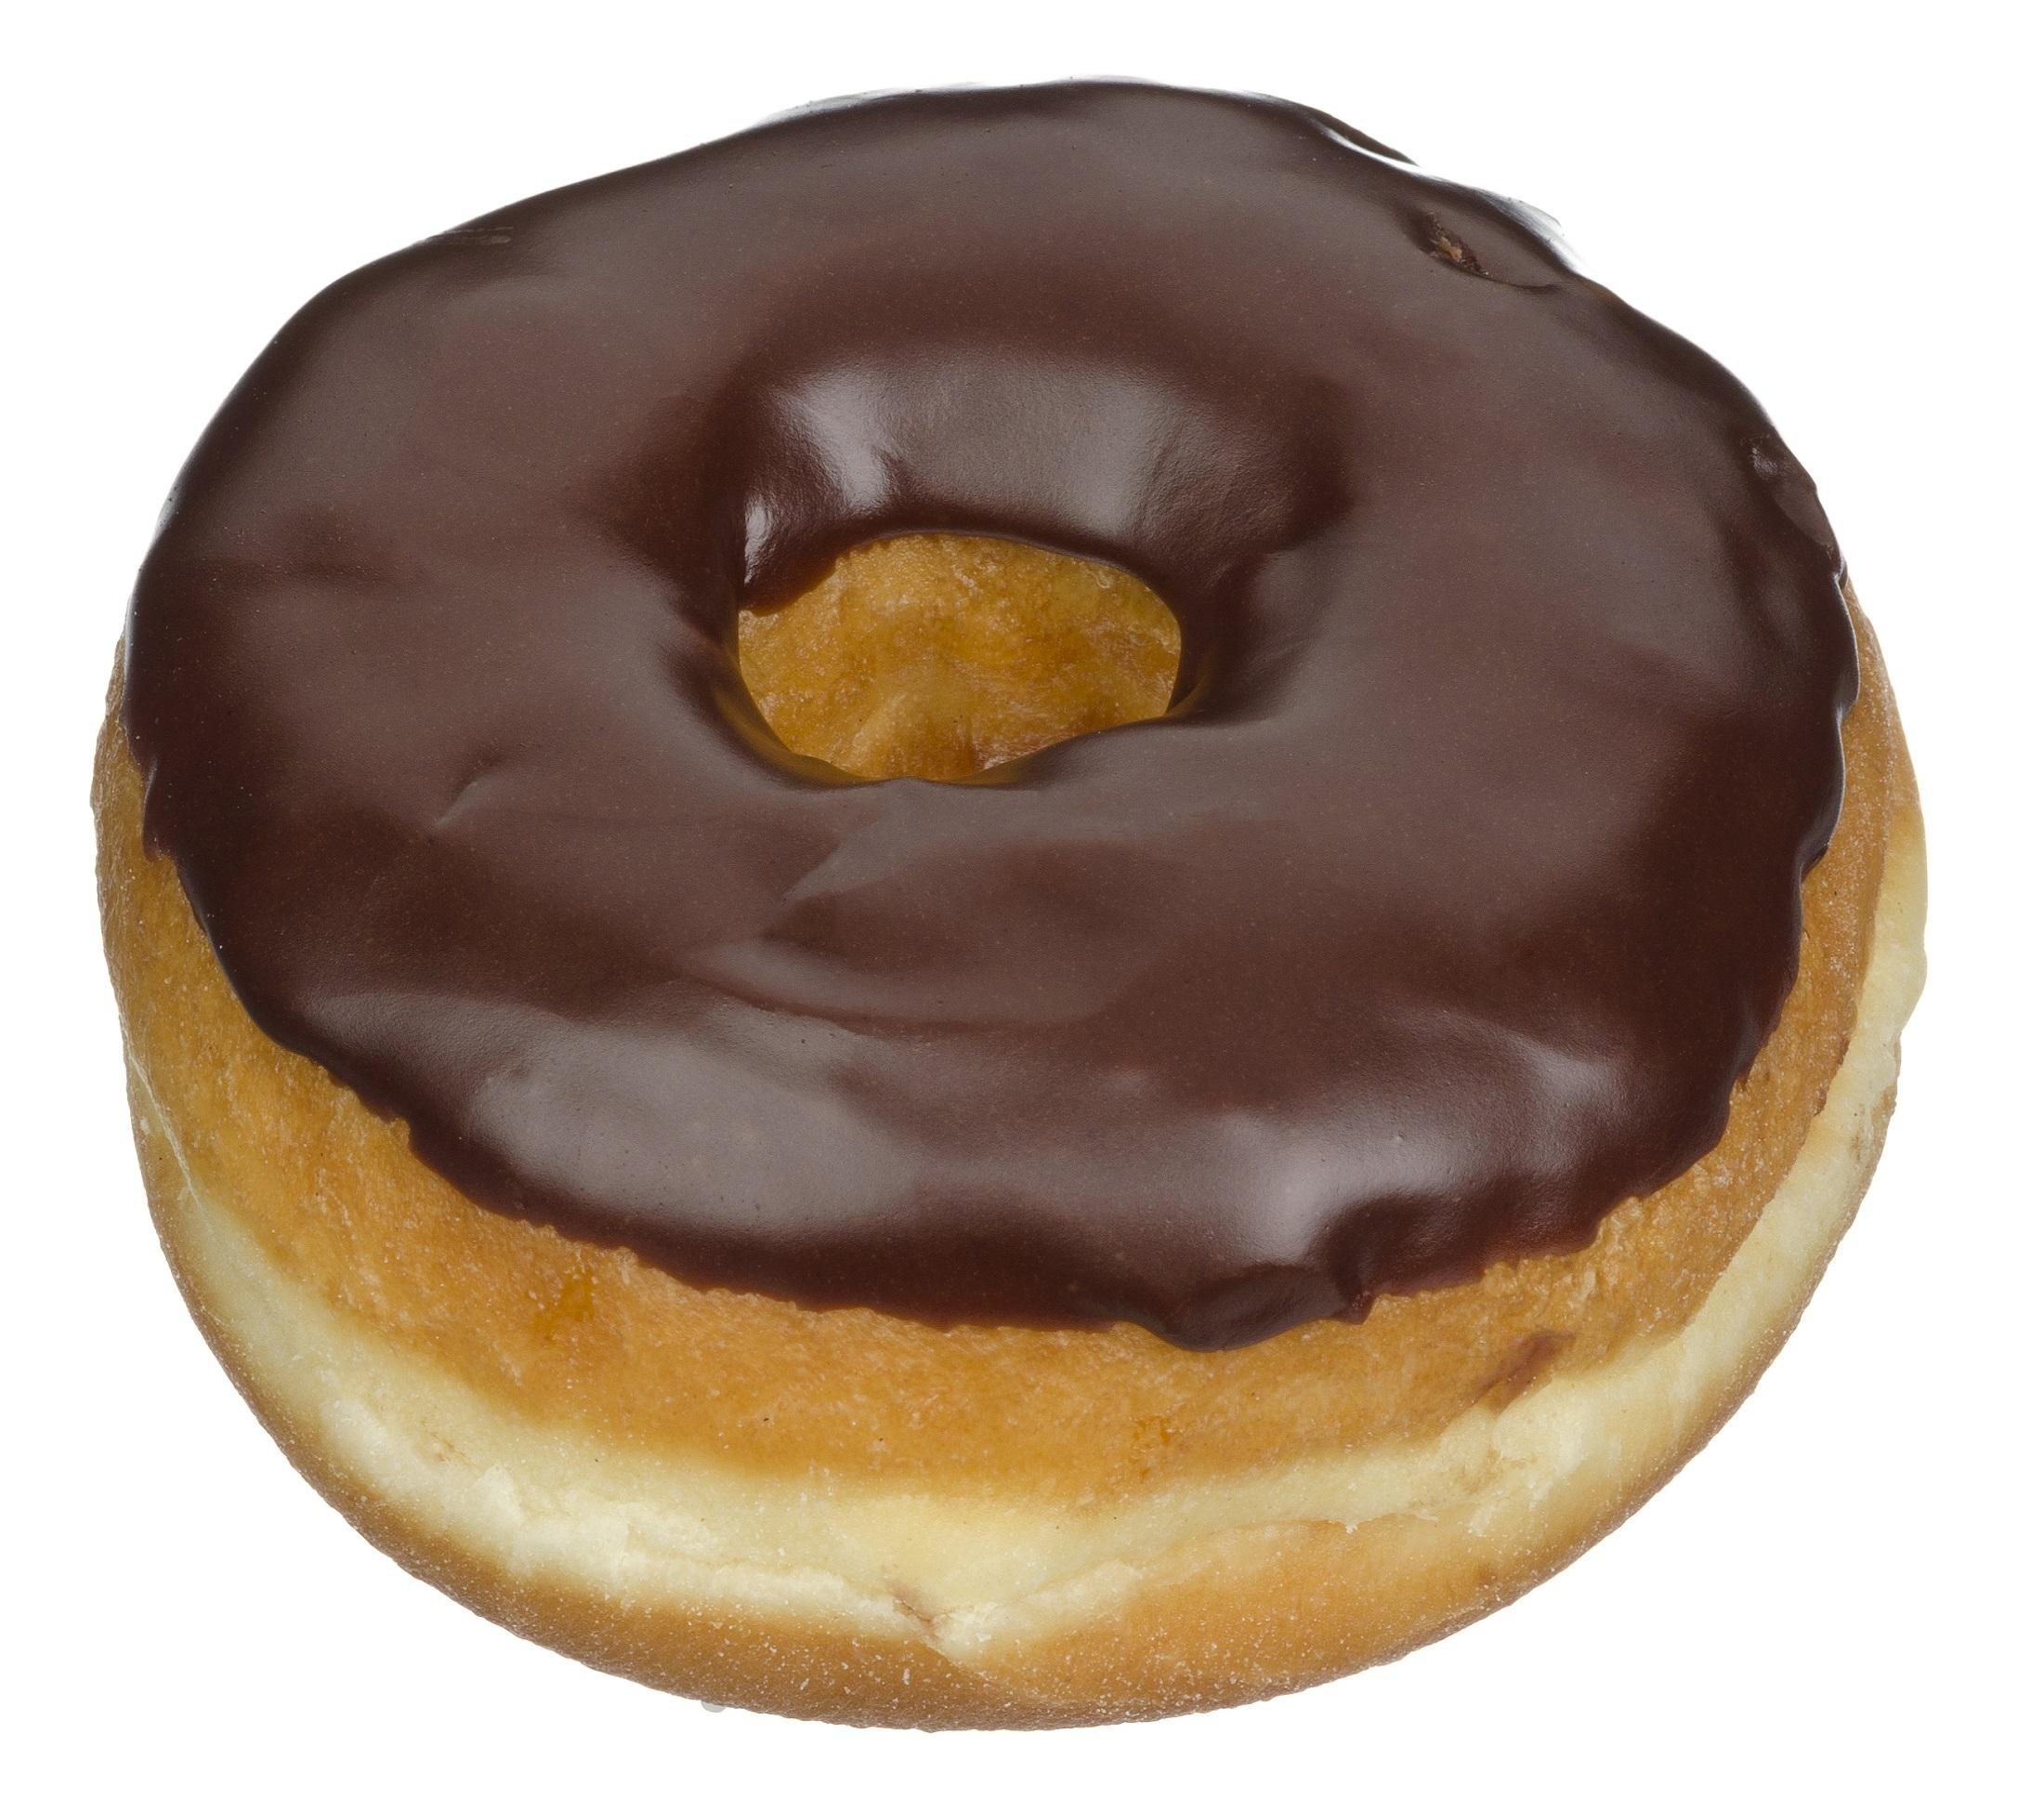 Free Images : sweet, hole, food, breakfast, snack, dessert ...